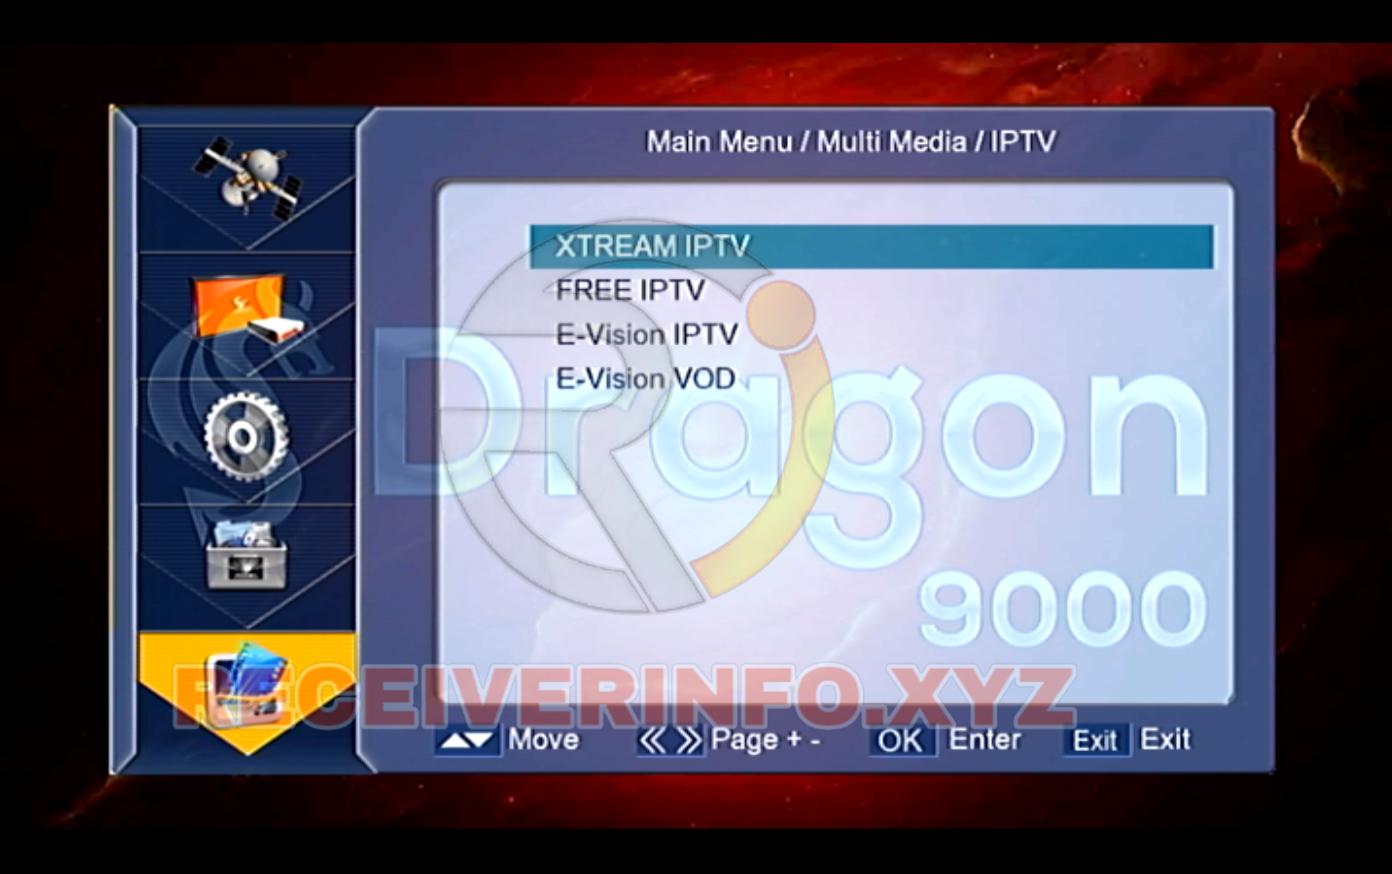 1506G NEW SOFTWARE 2020 WIFI XTREAM IPTV SUNPLUS 1506G NEW SOFTWARE